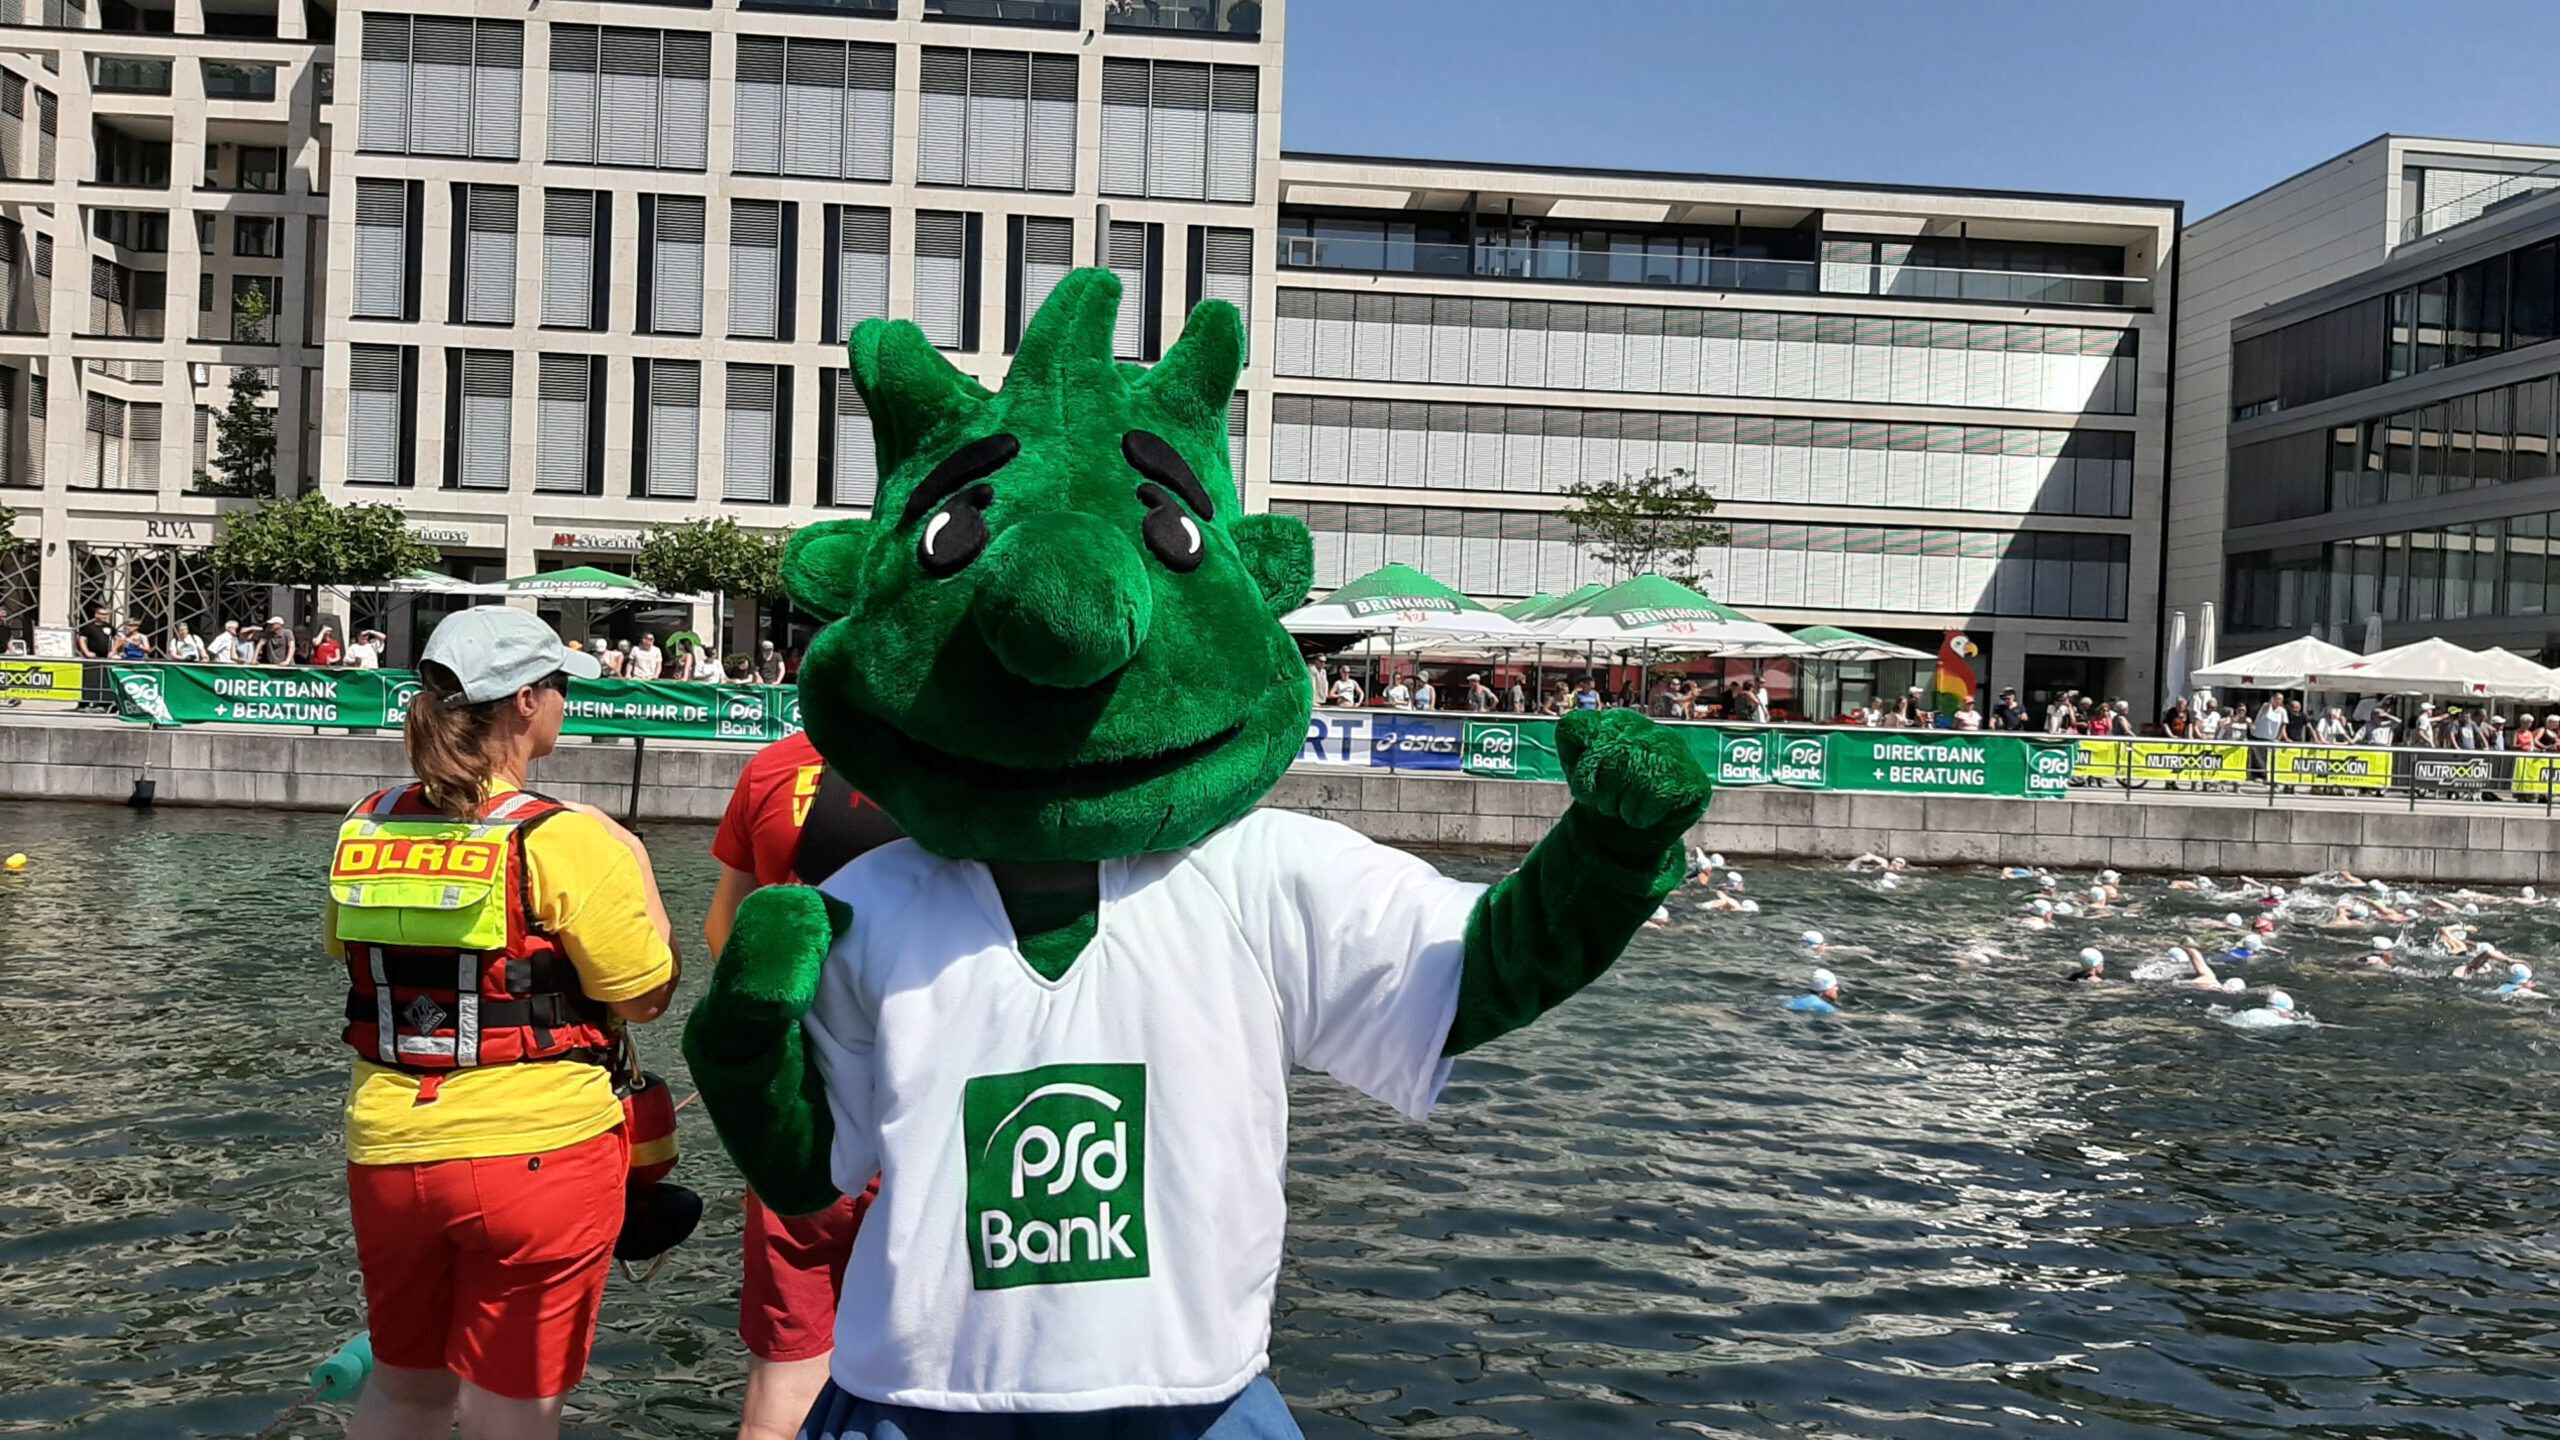 Paracyling Weltmeister Hans-Peter Durst startet in Dortmund